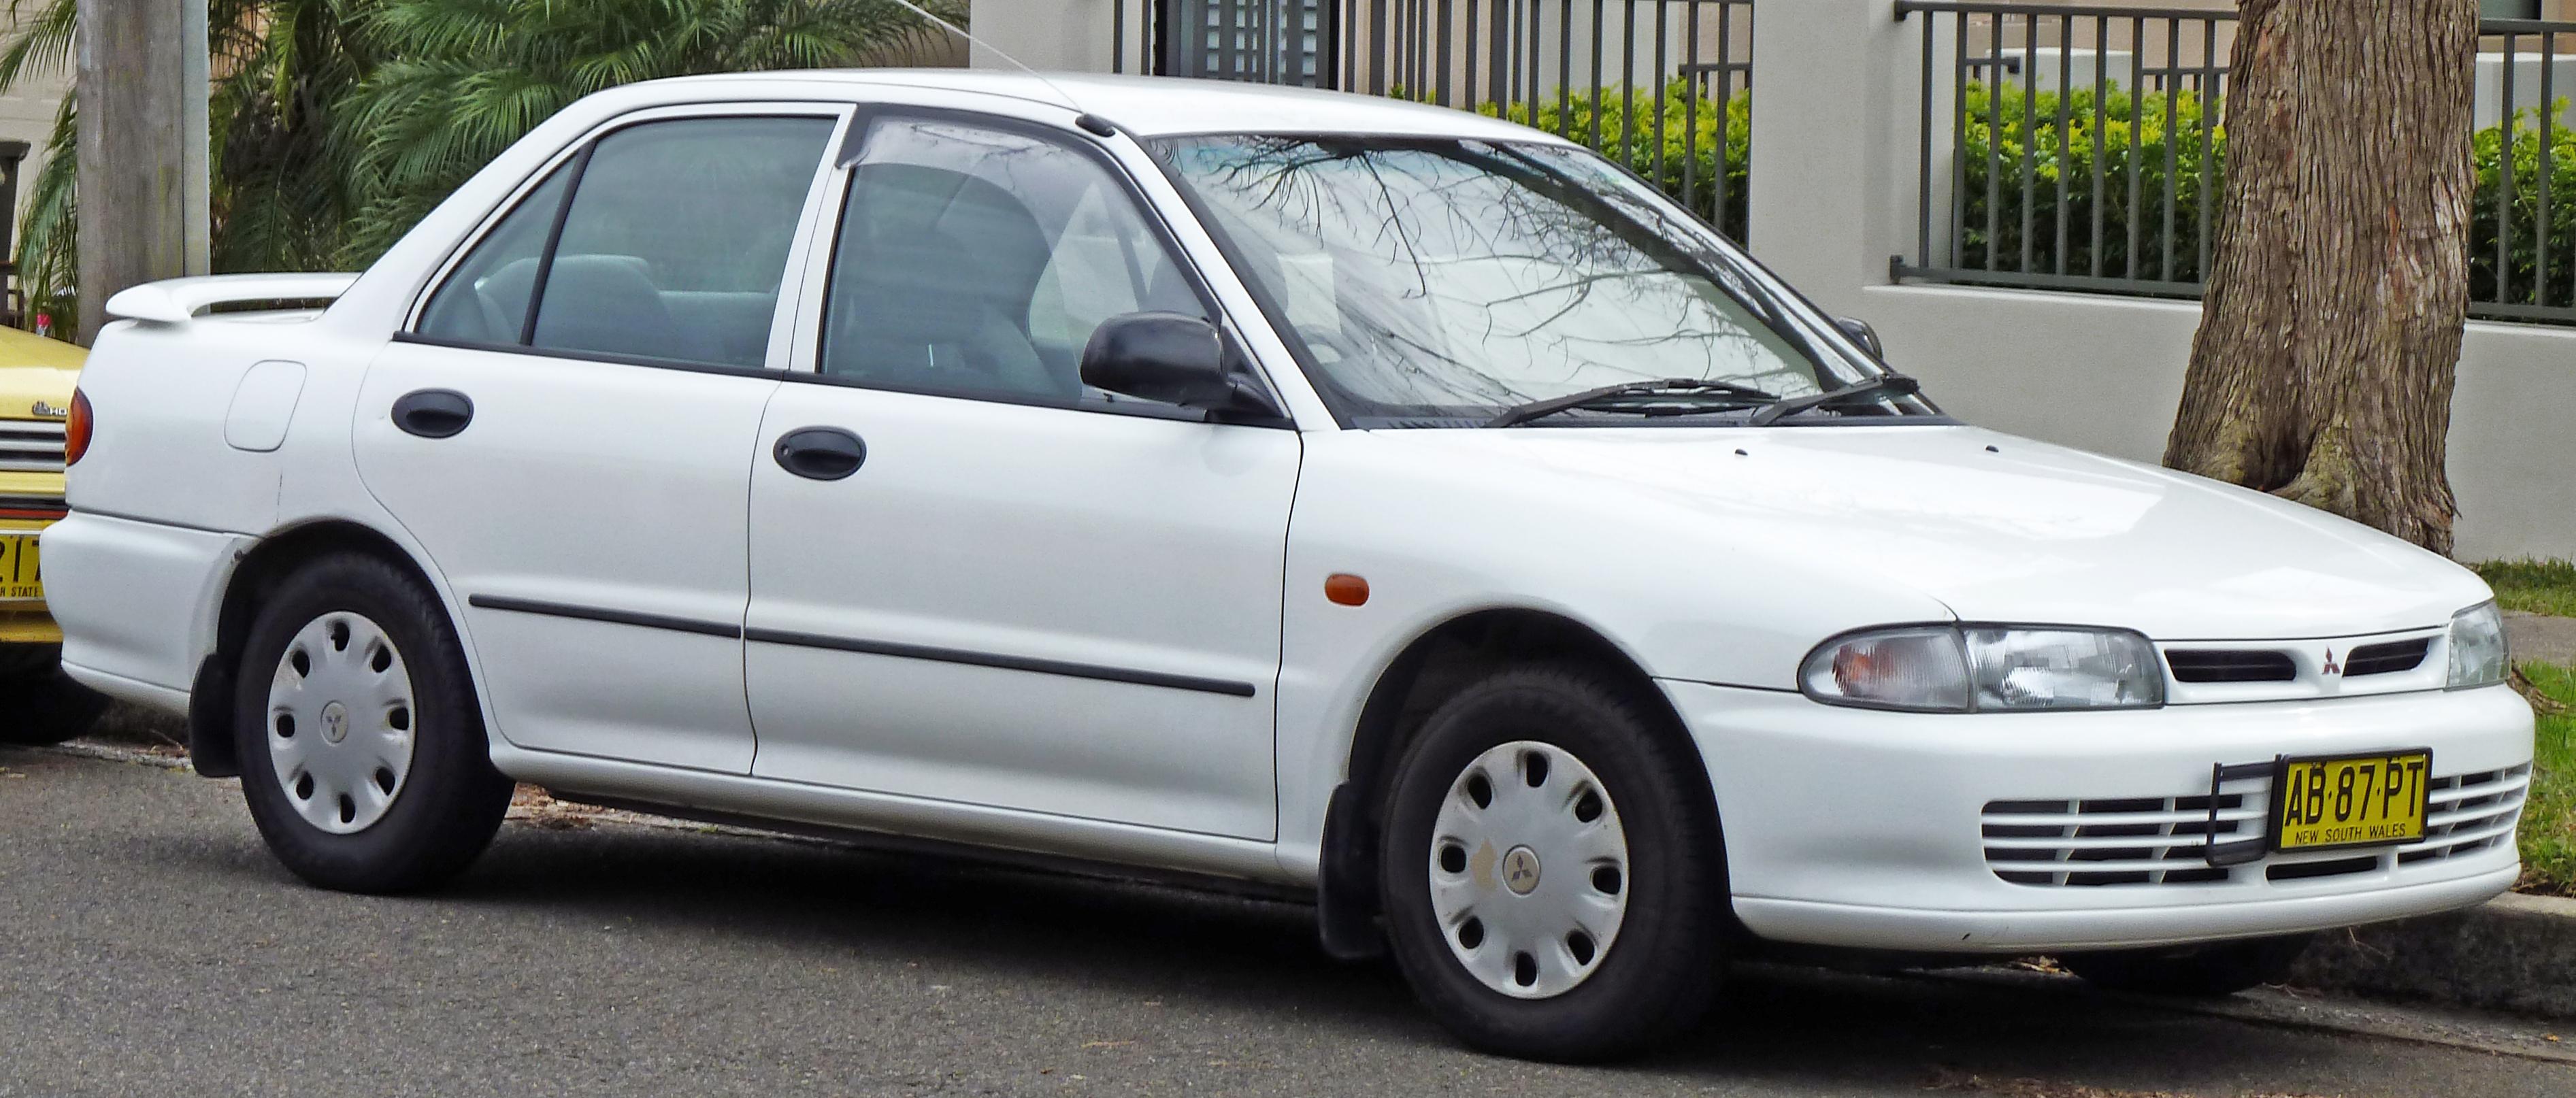 File1993 1996 Mitsubishi Lancer CC Executive Sedan 01